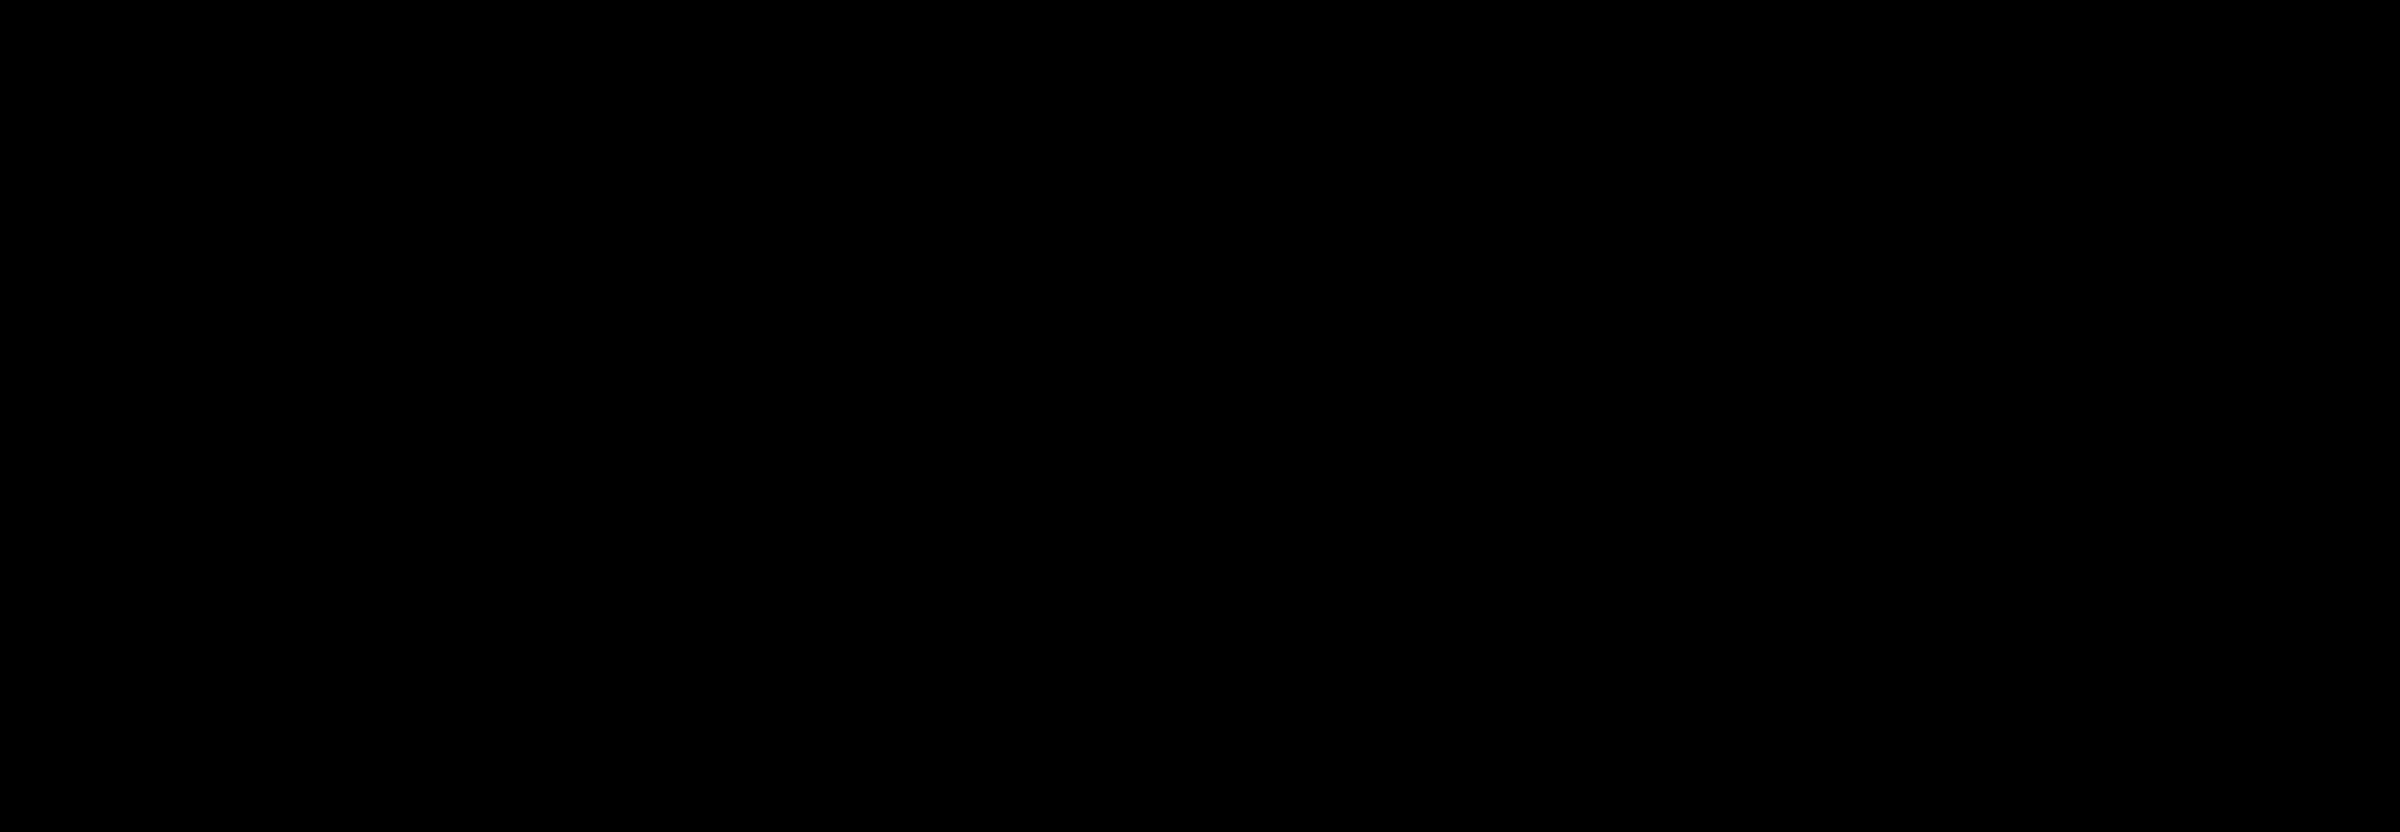 Bbc Picture: BBC Logo PNG Transparent & SVG Vector